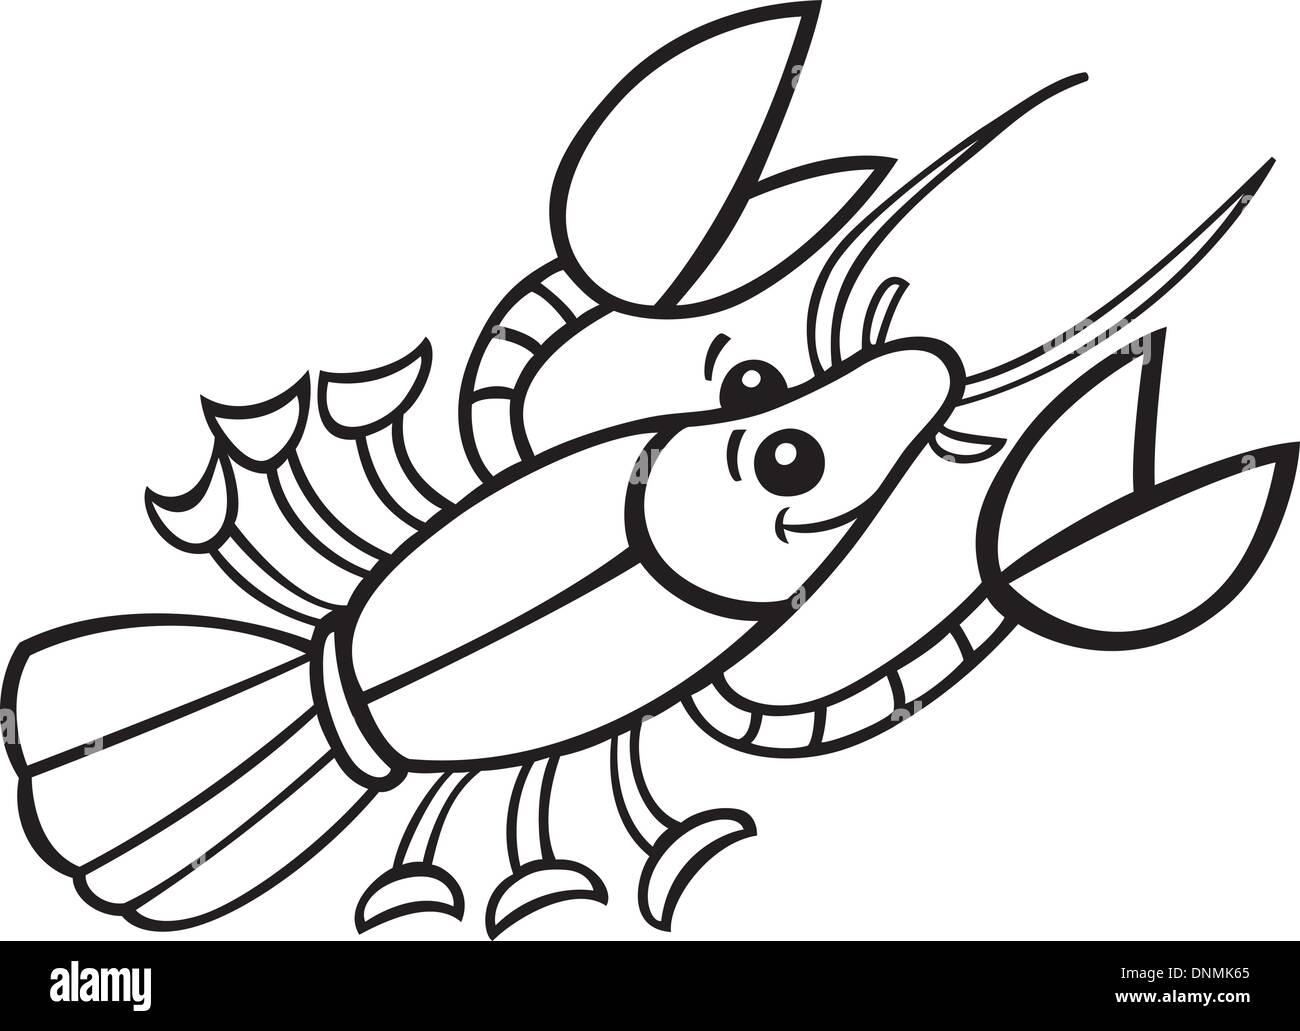 Crayfish Black And White Stock Photos Amp Images